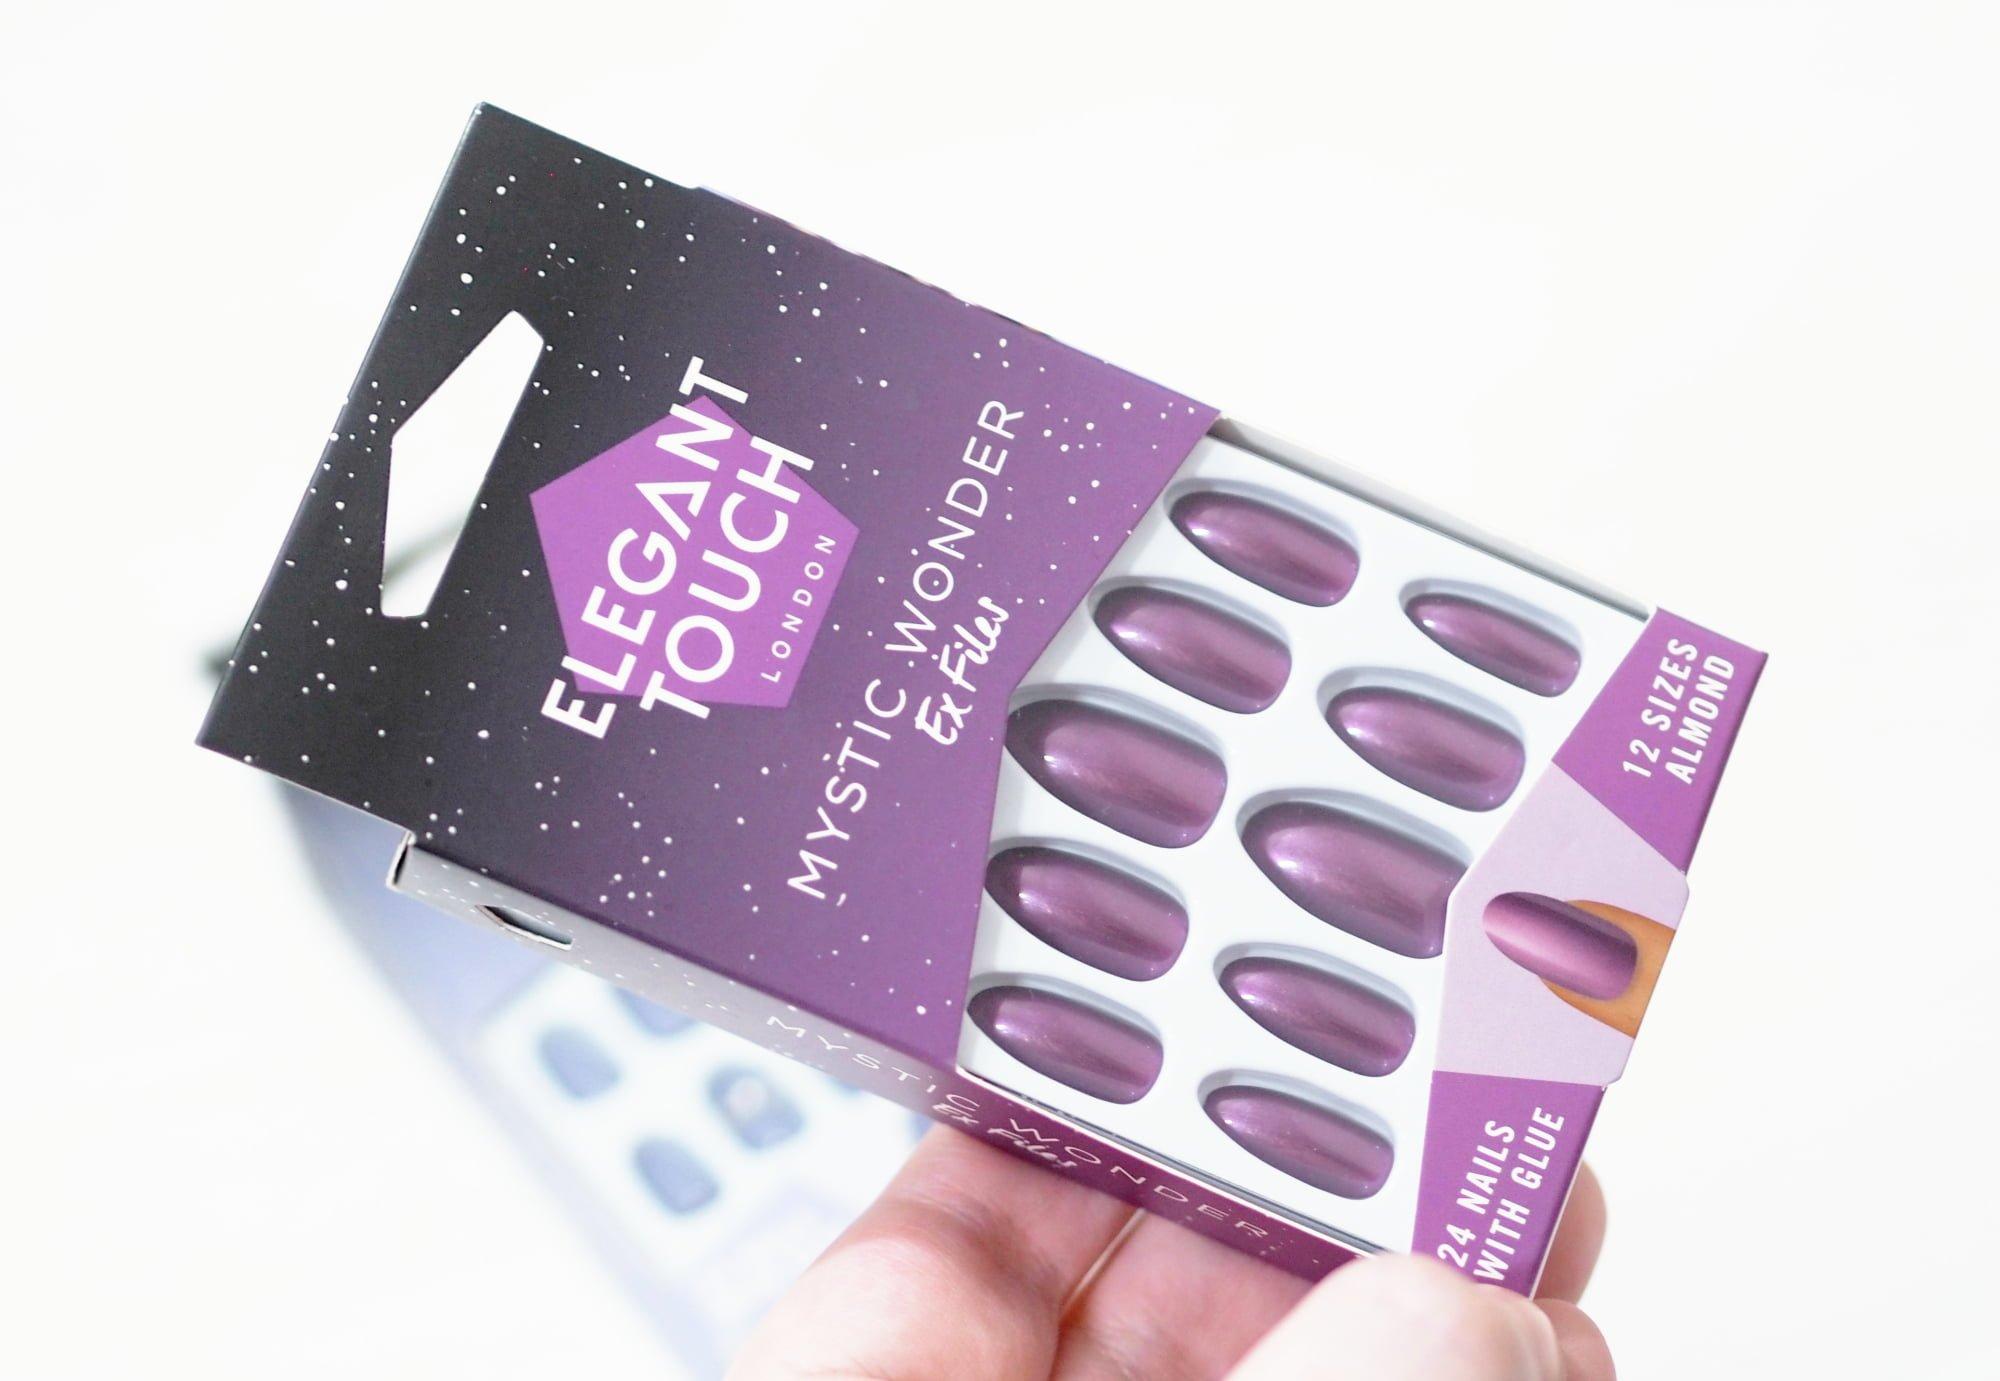 Elegant Touch Mystic Wonder Collection